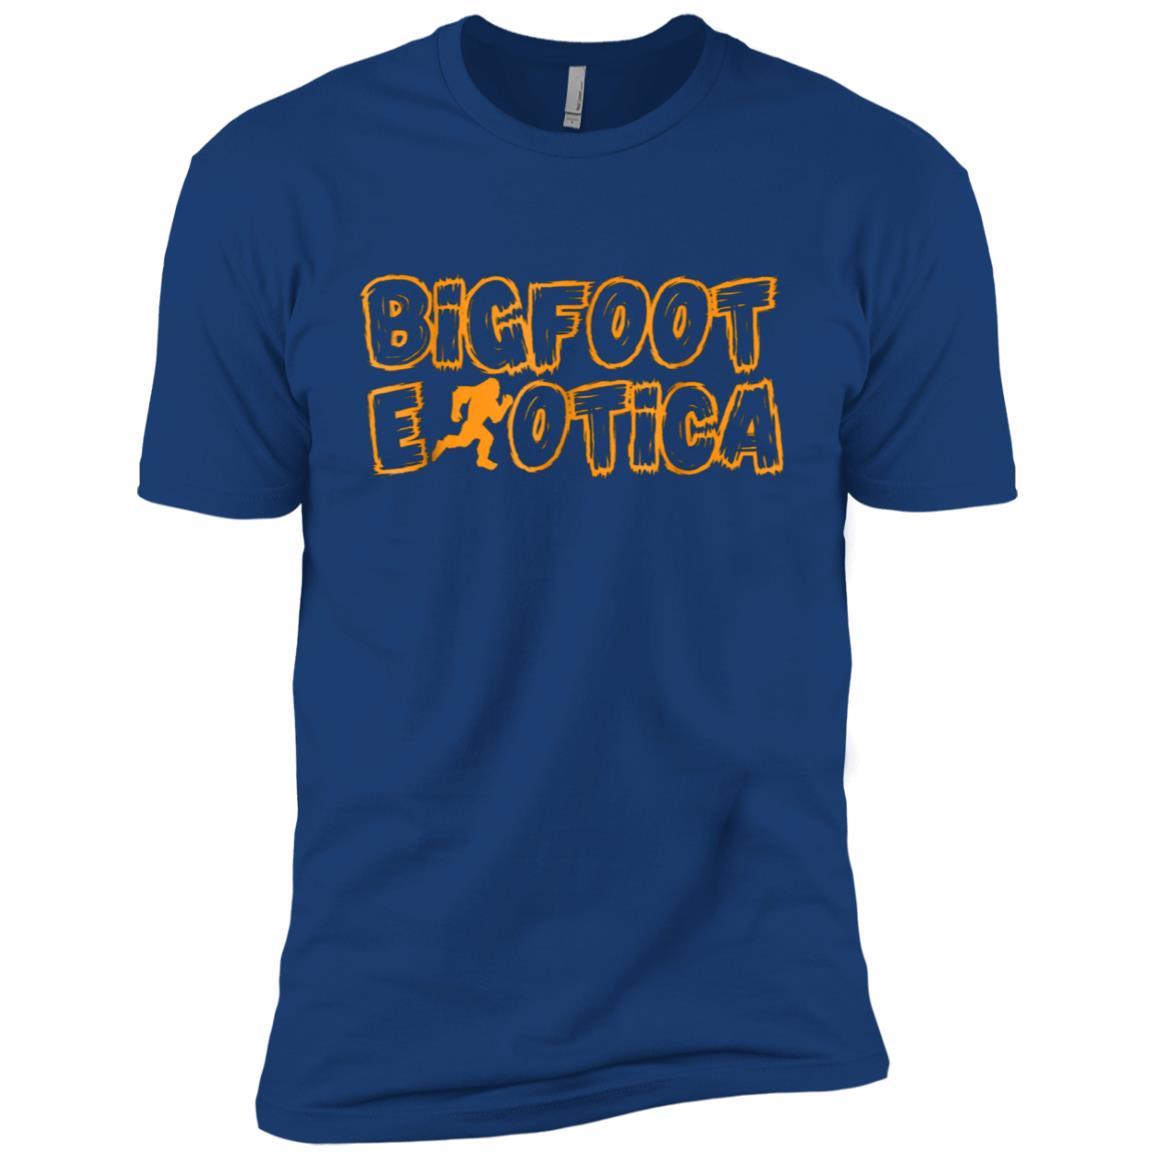 BigFoot Erotica Funny , Monsterotica Men Short Sleeve T-Shirt